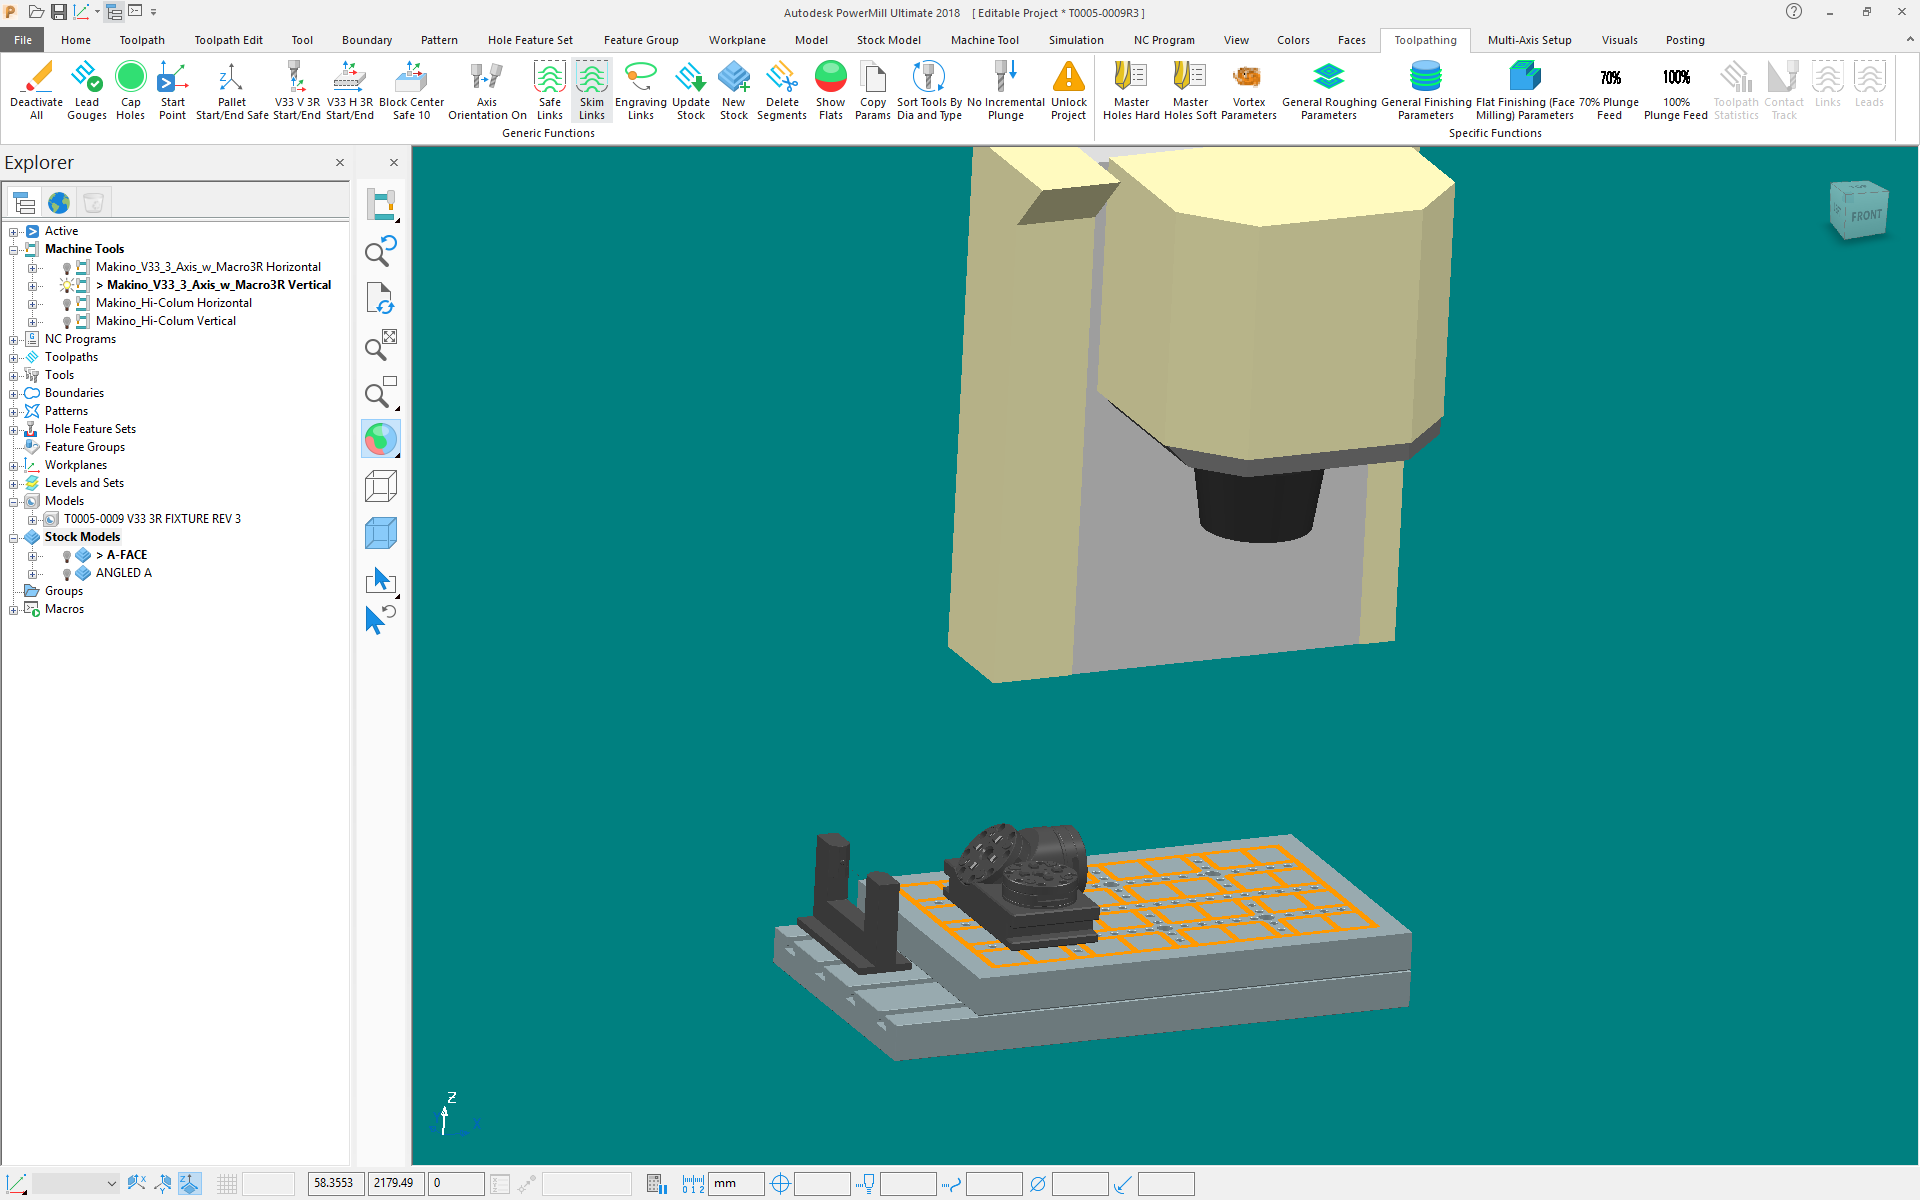 2018 custom setup - Autodesk Community- PowerMill